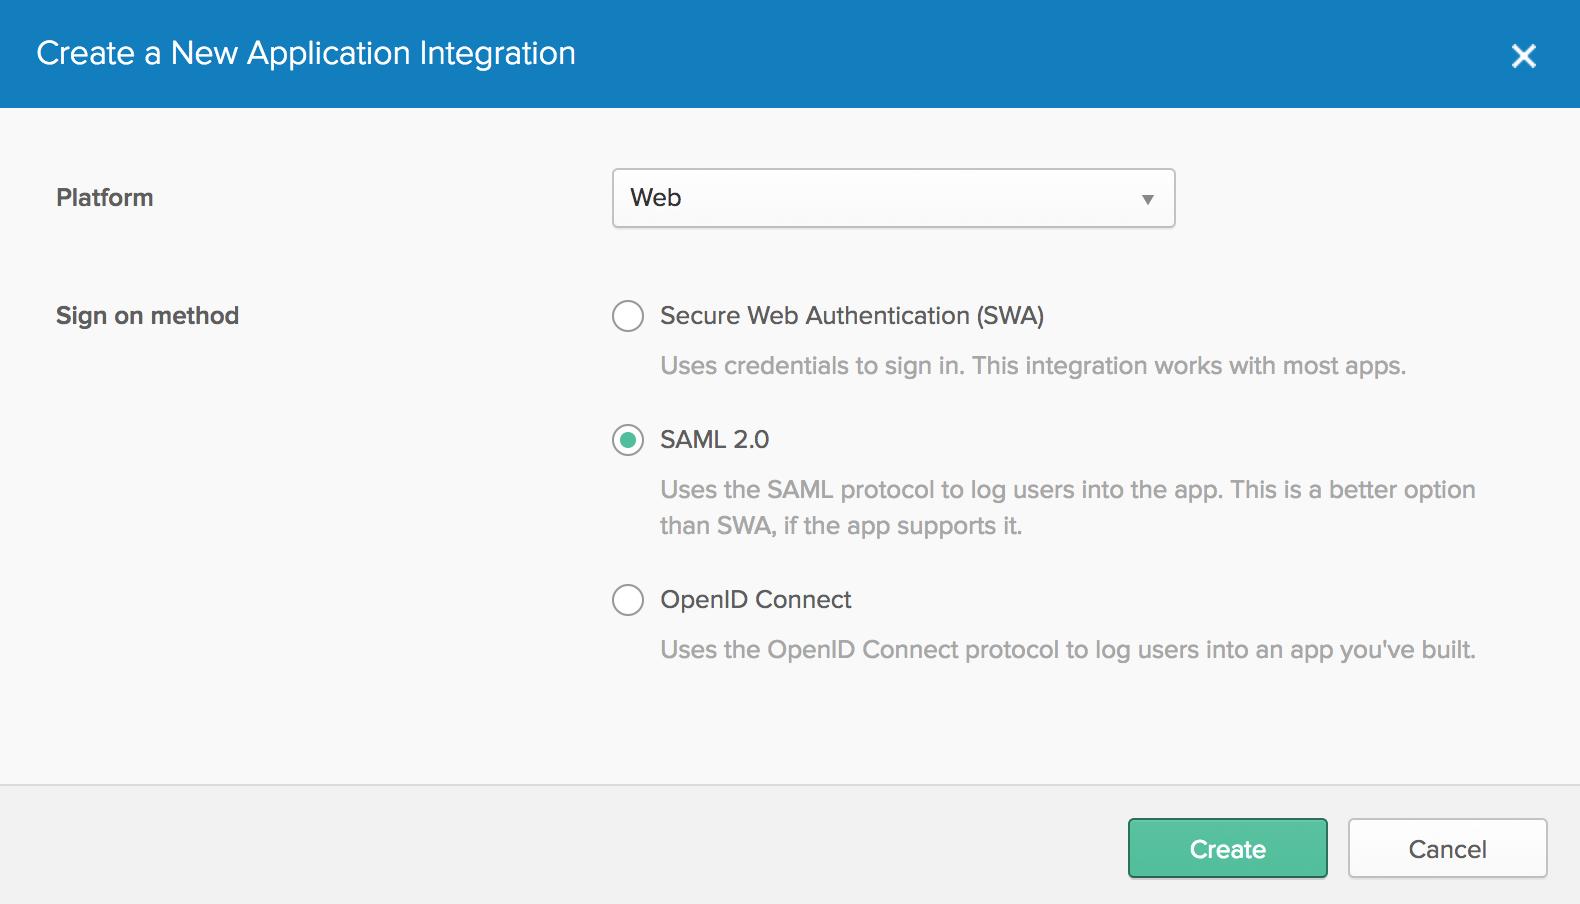 New App with SAML 2.0